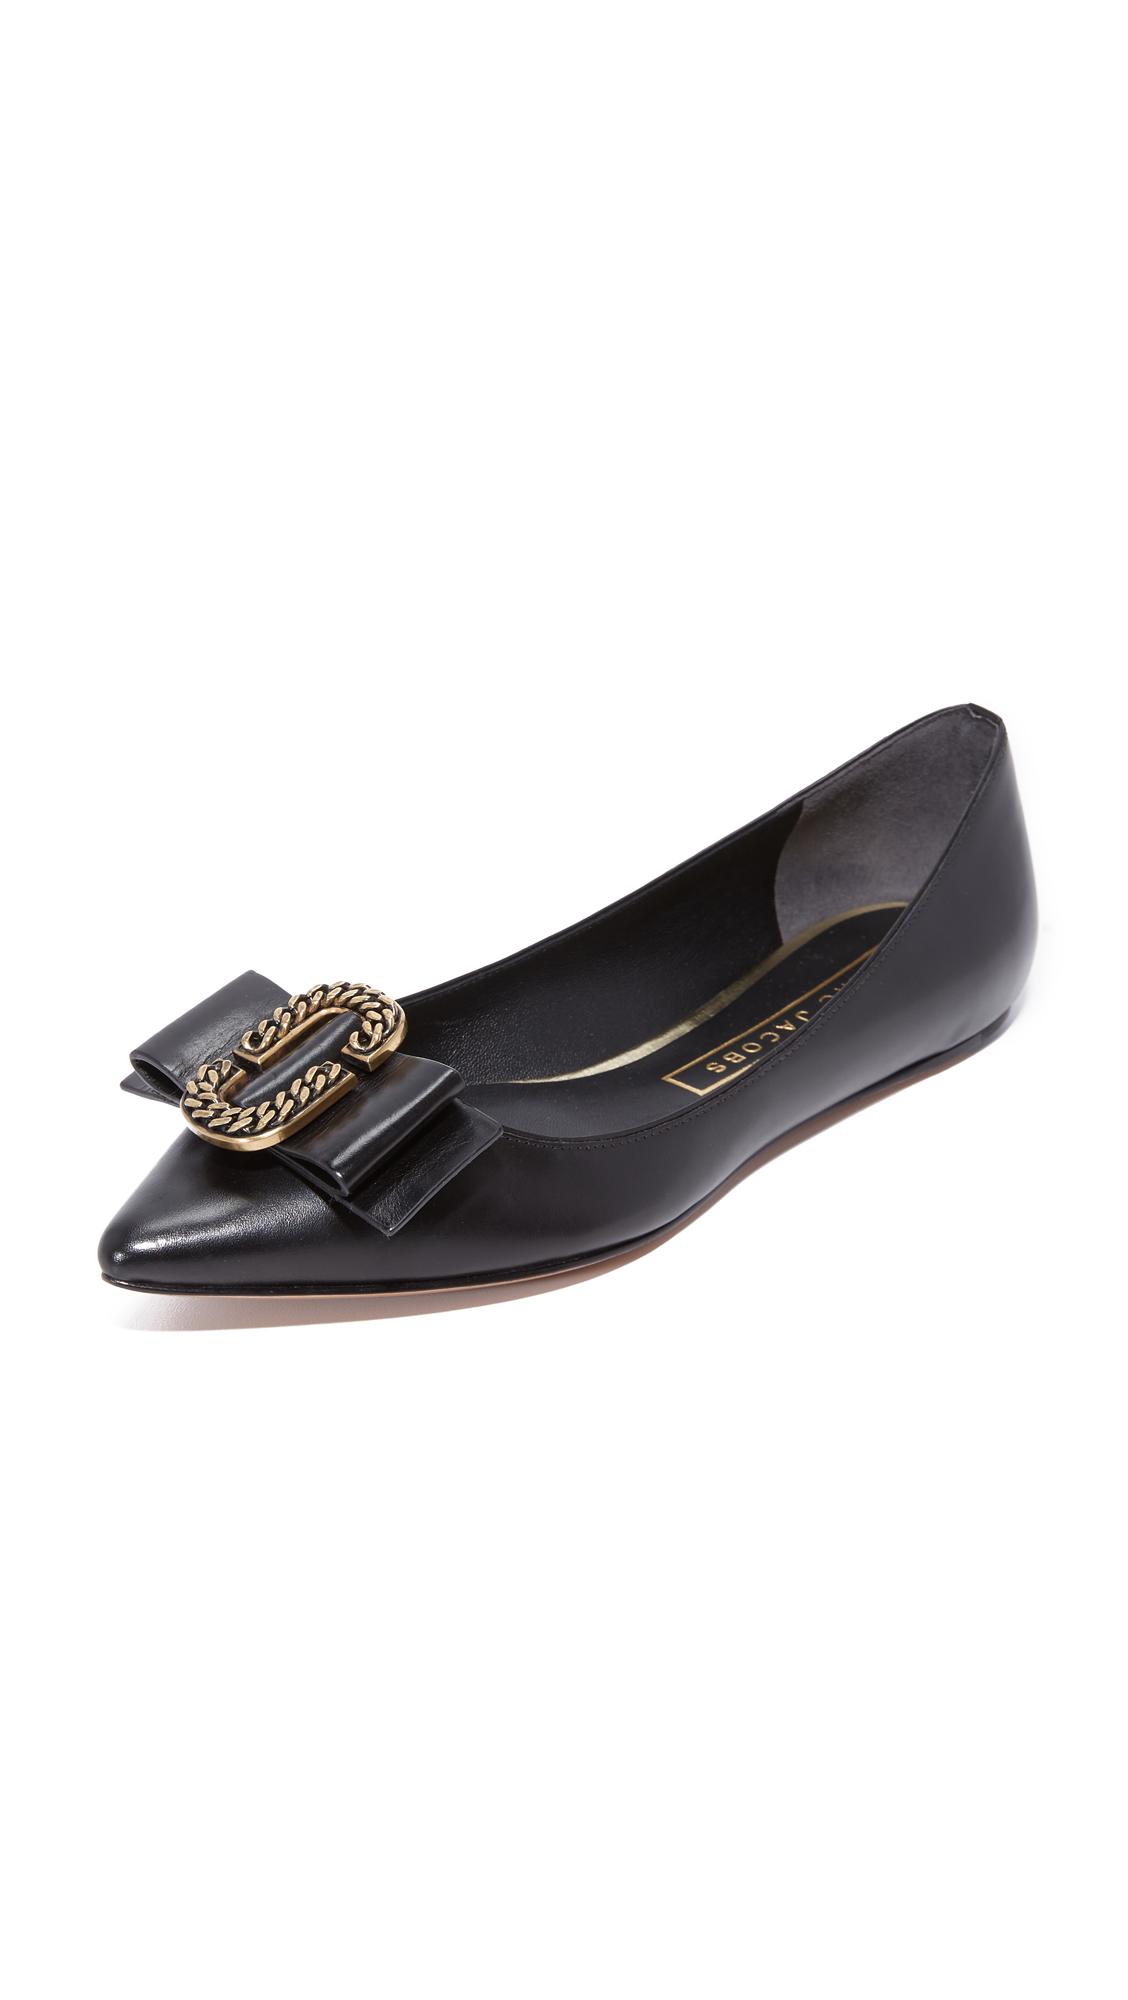 marc jacobs female marc jacobs interlock pointy toe ballerina flats black